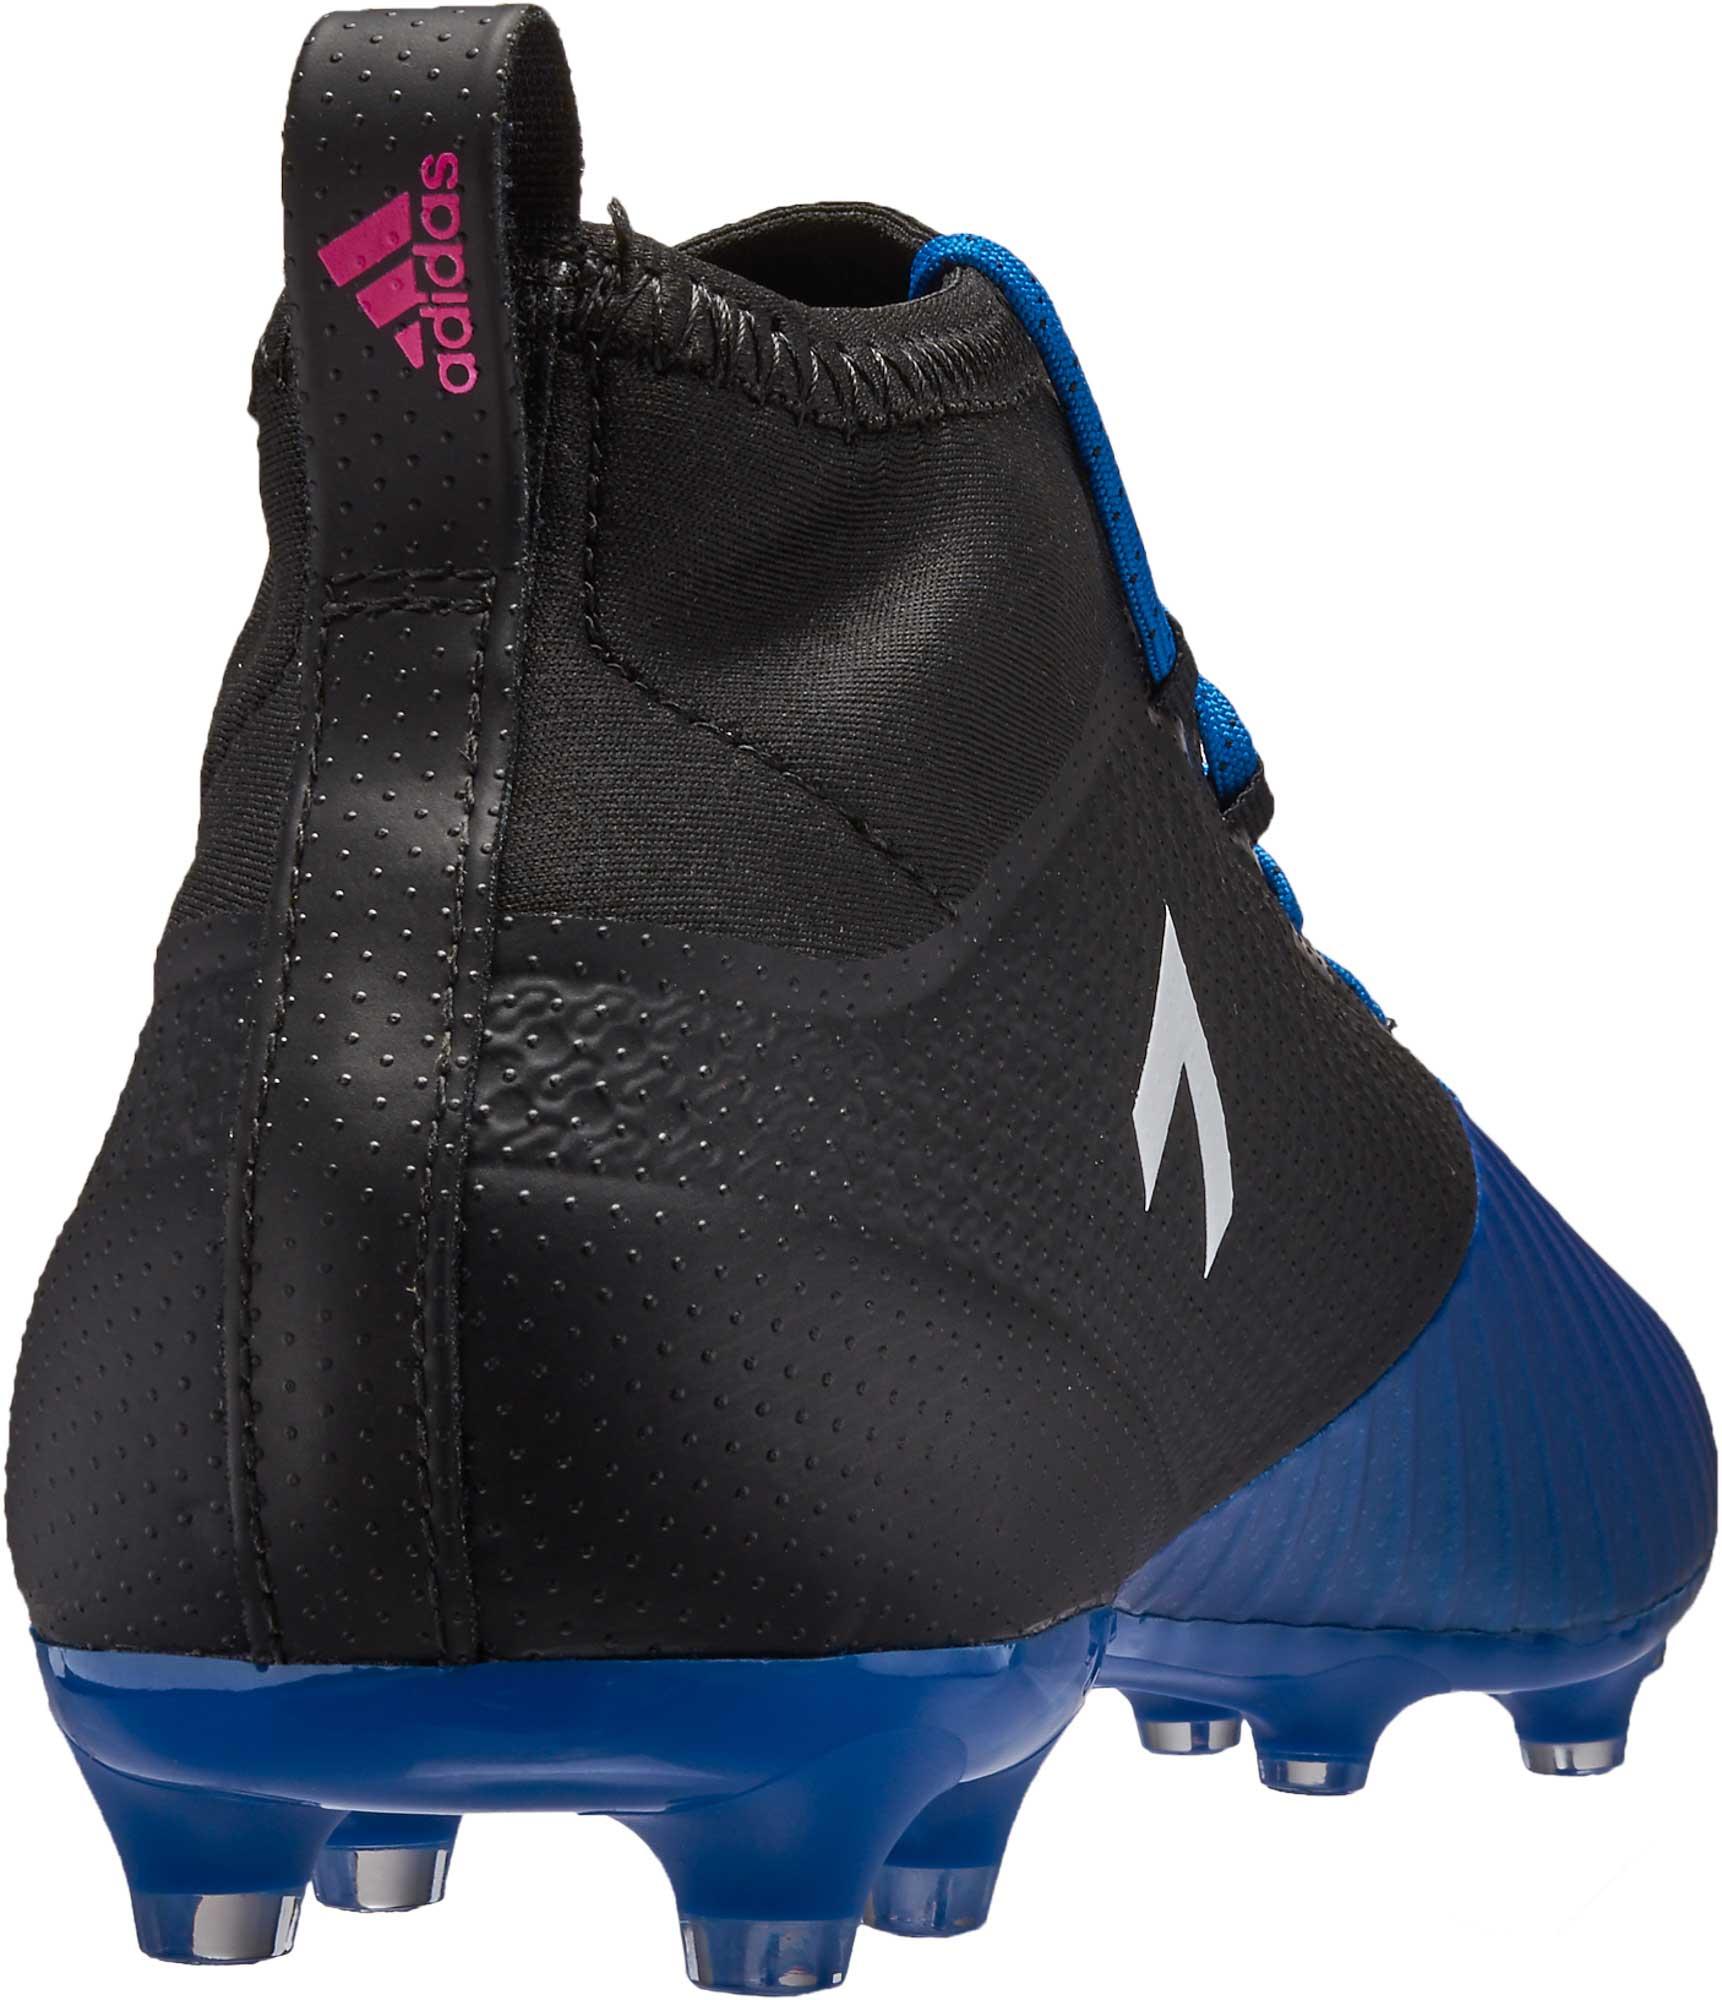 huge discount 254ff c87a7 adidas ACE 17.2 Primemesh FG Soccer Cleats - Black